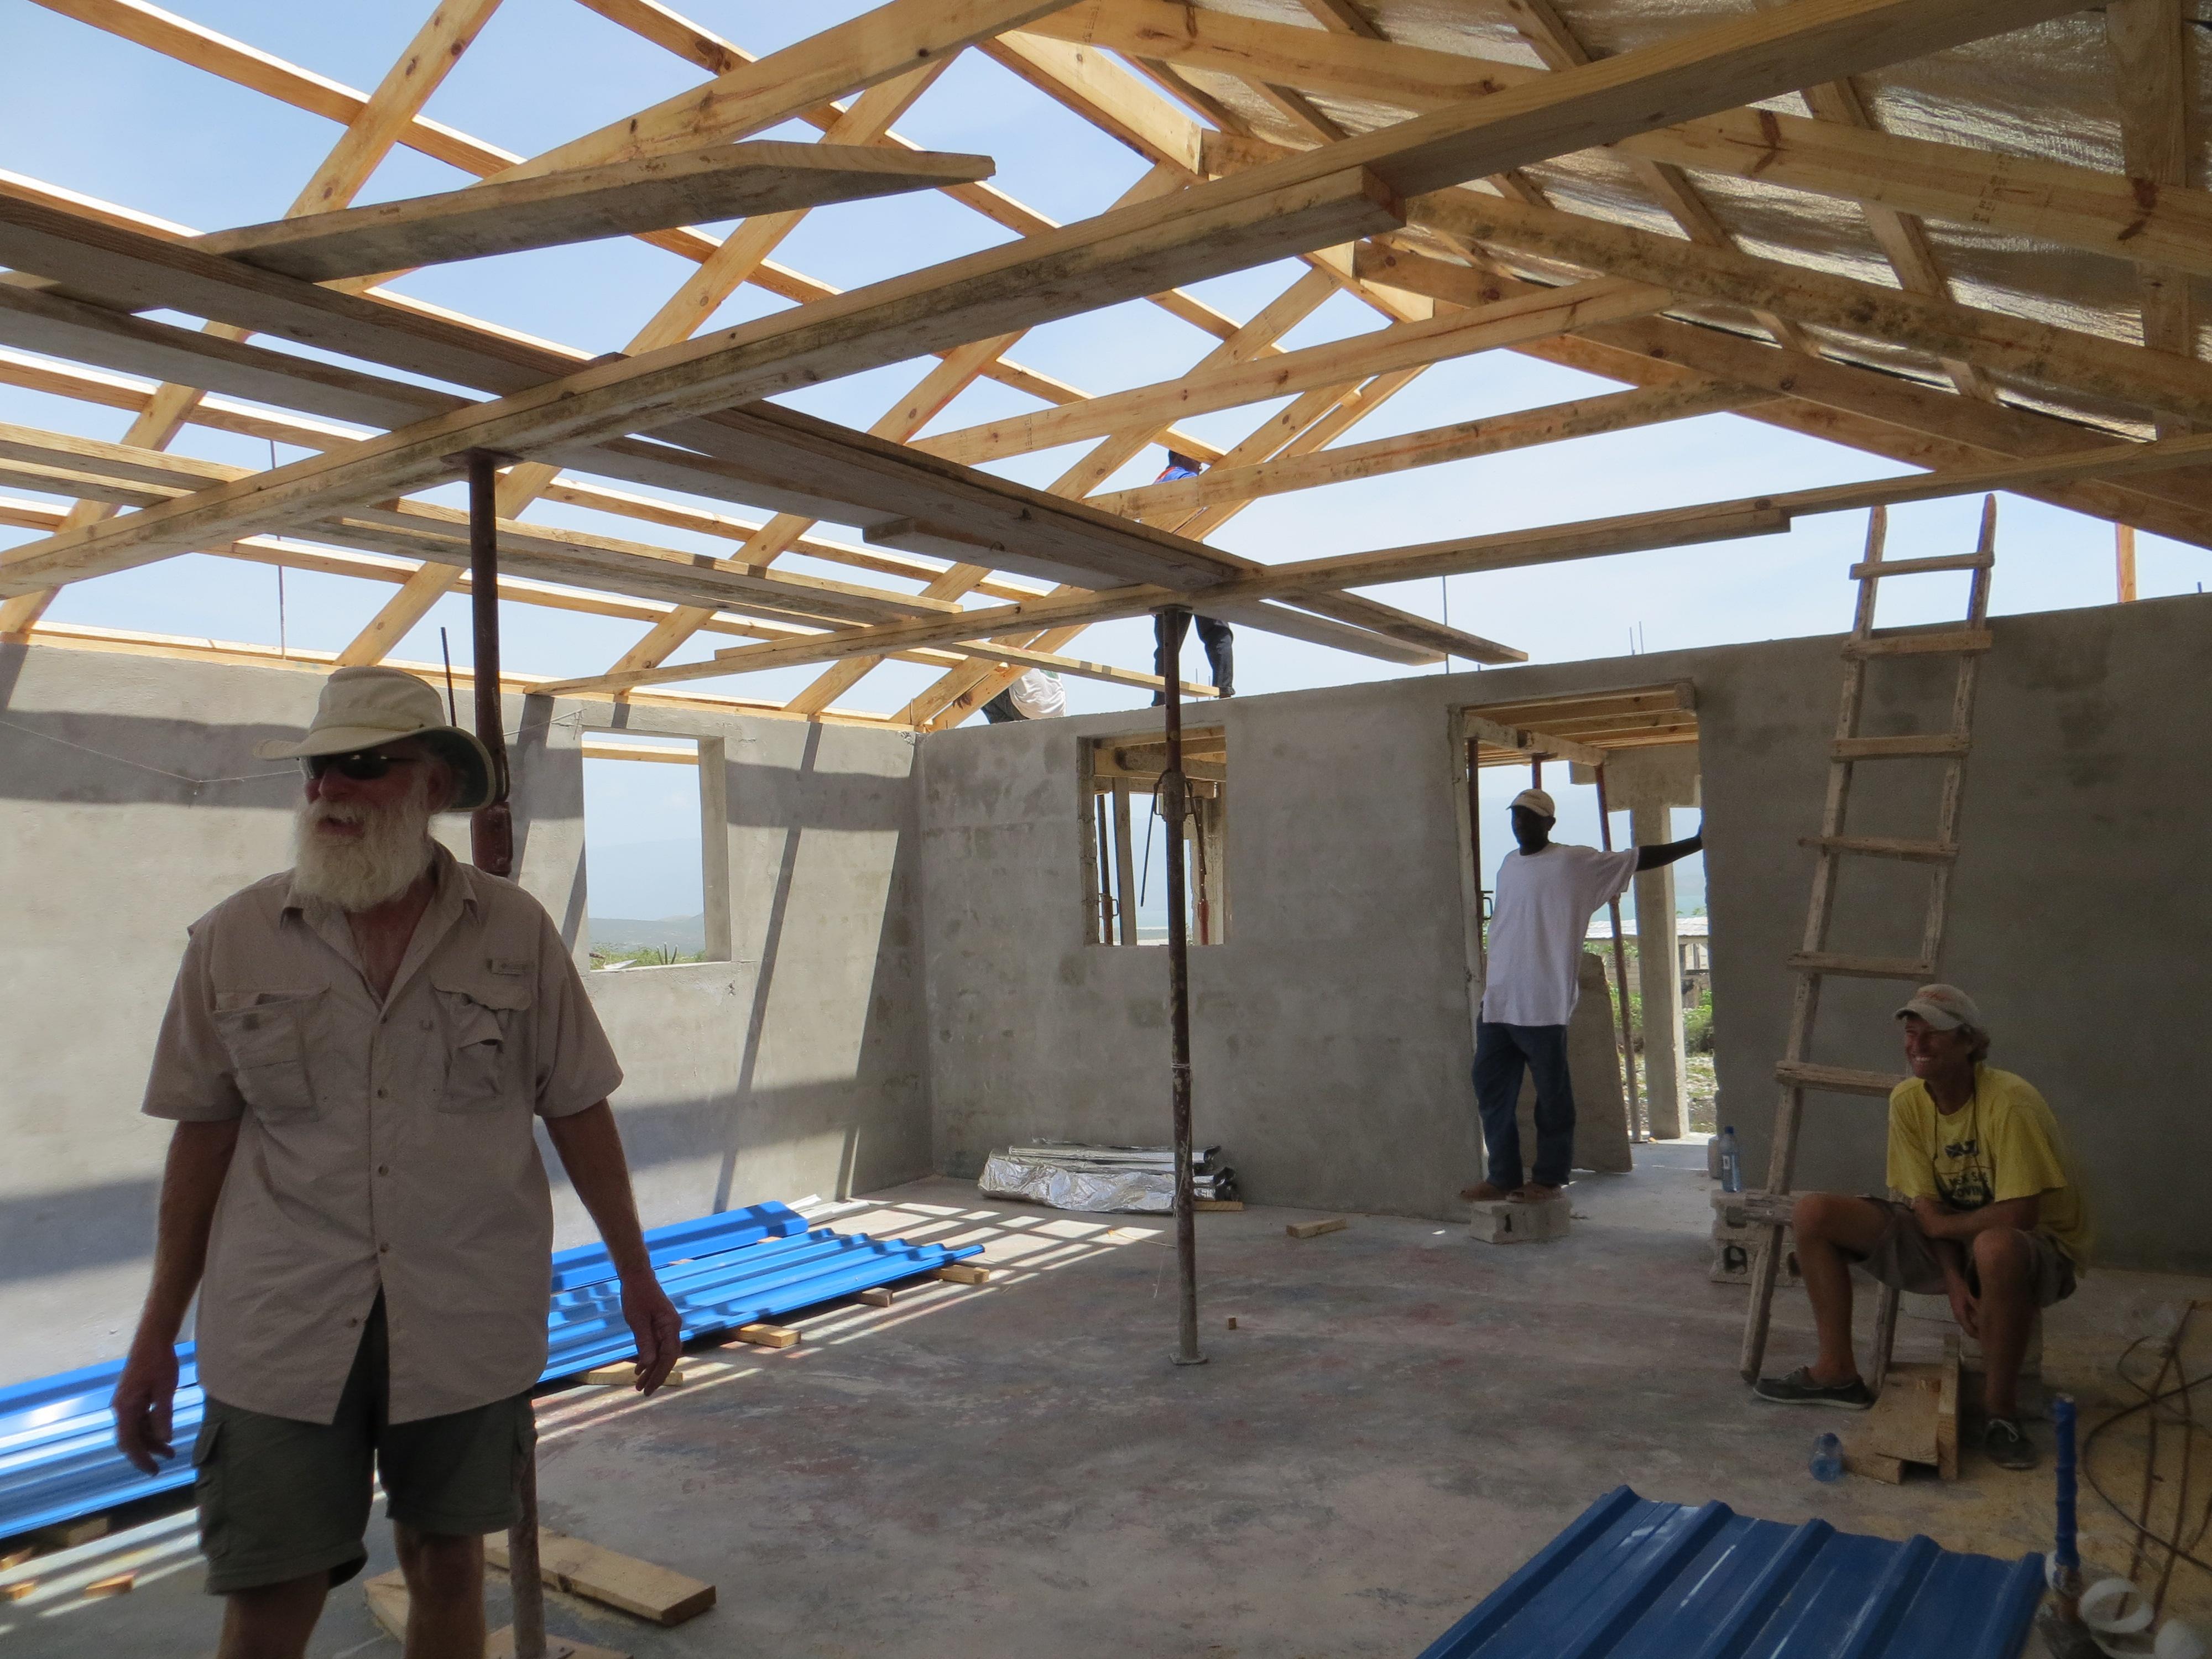 Inside the new base at Fonds-Parisien under construction.